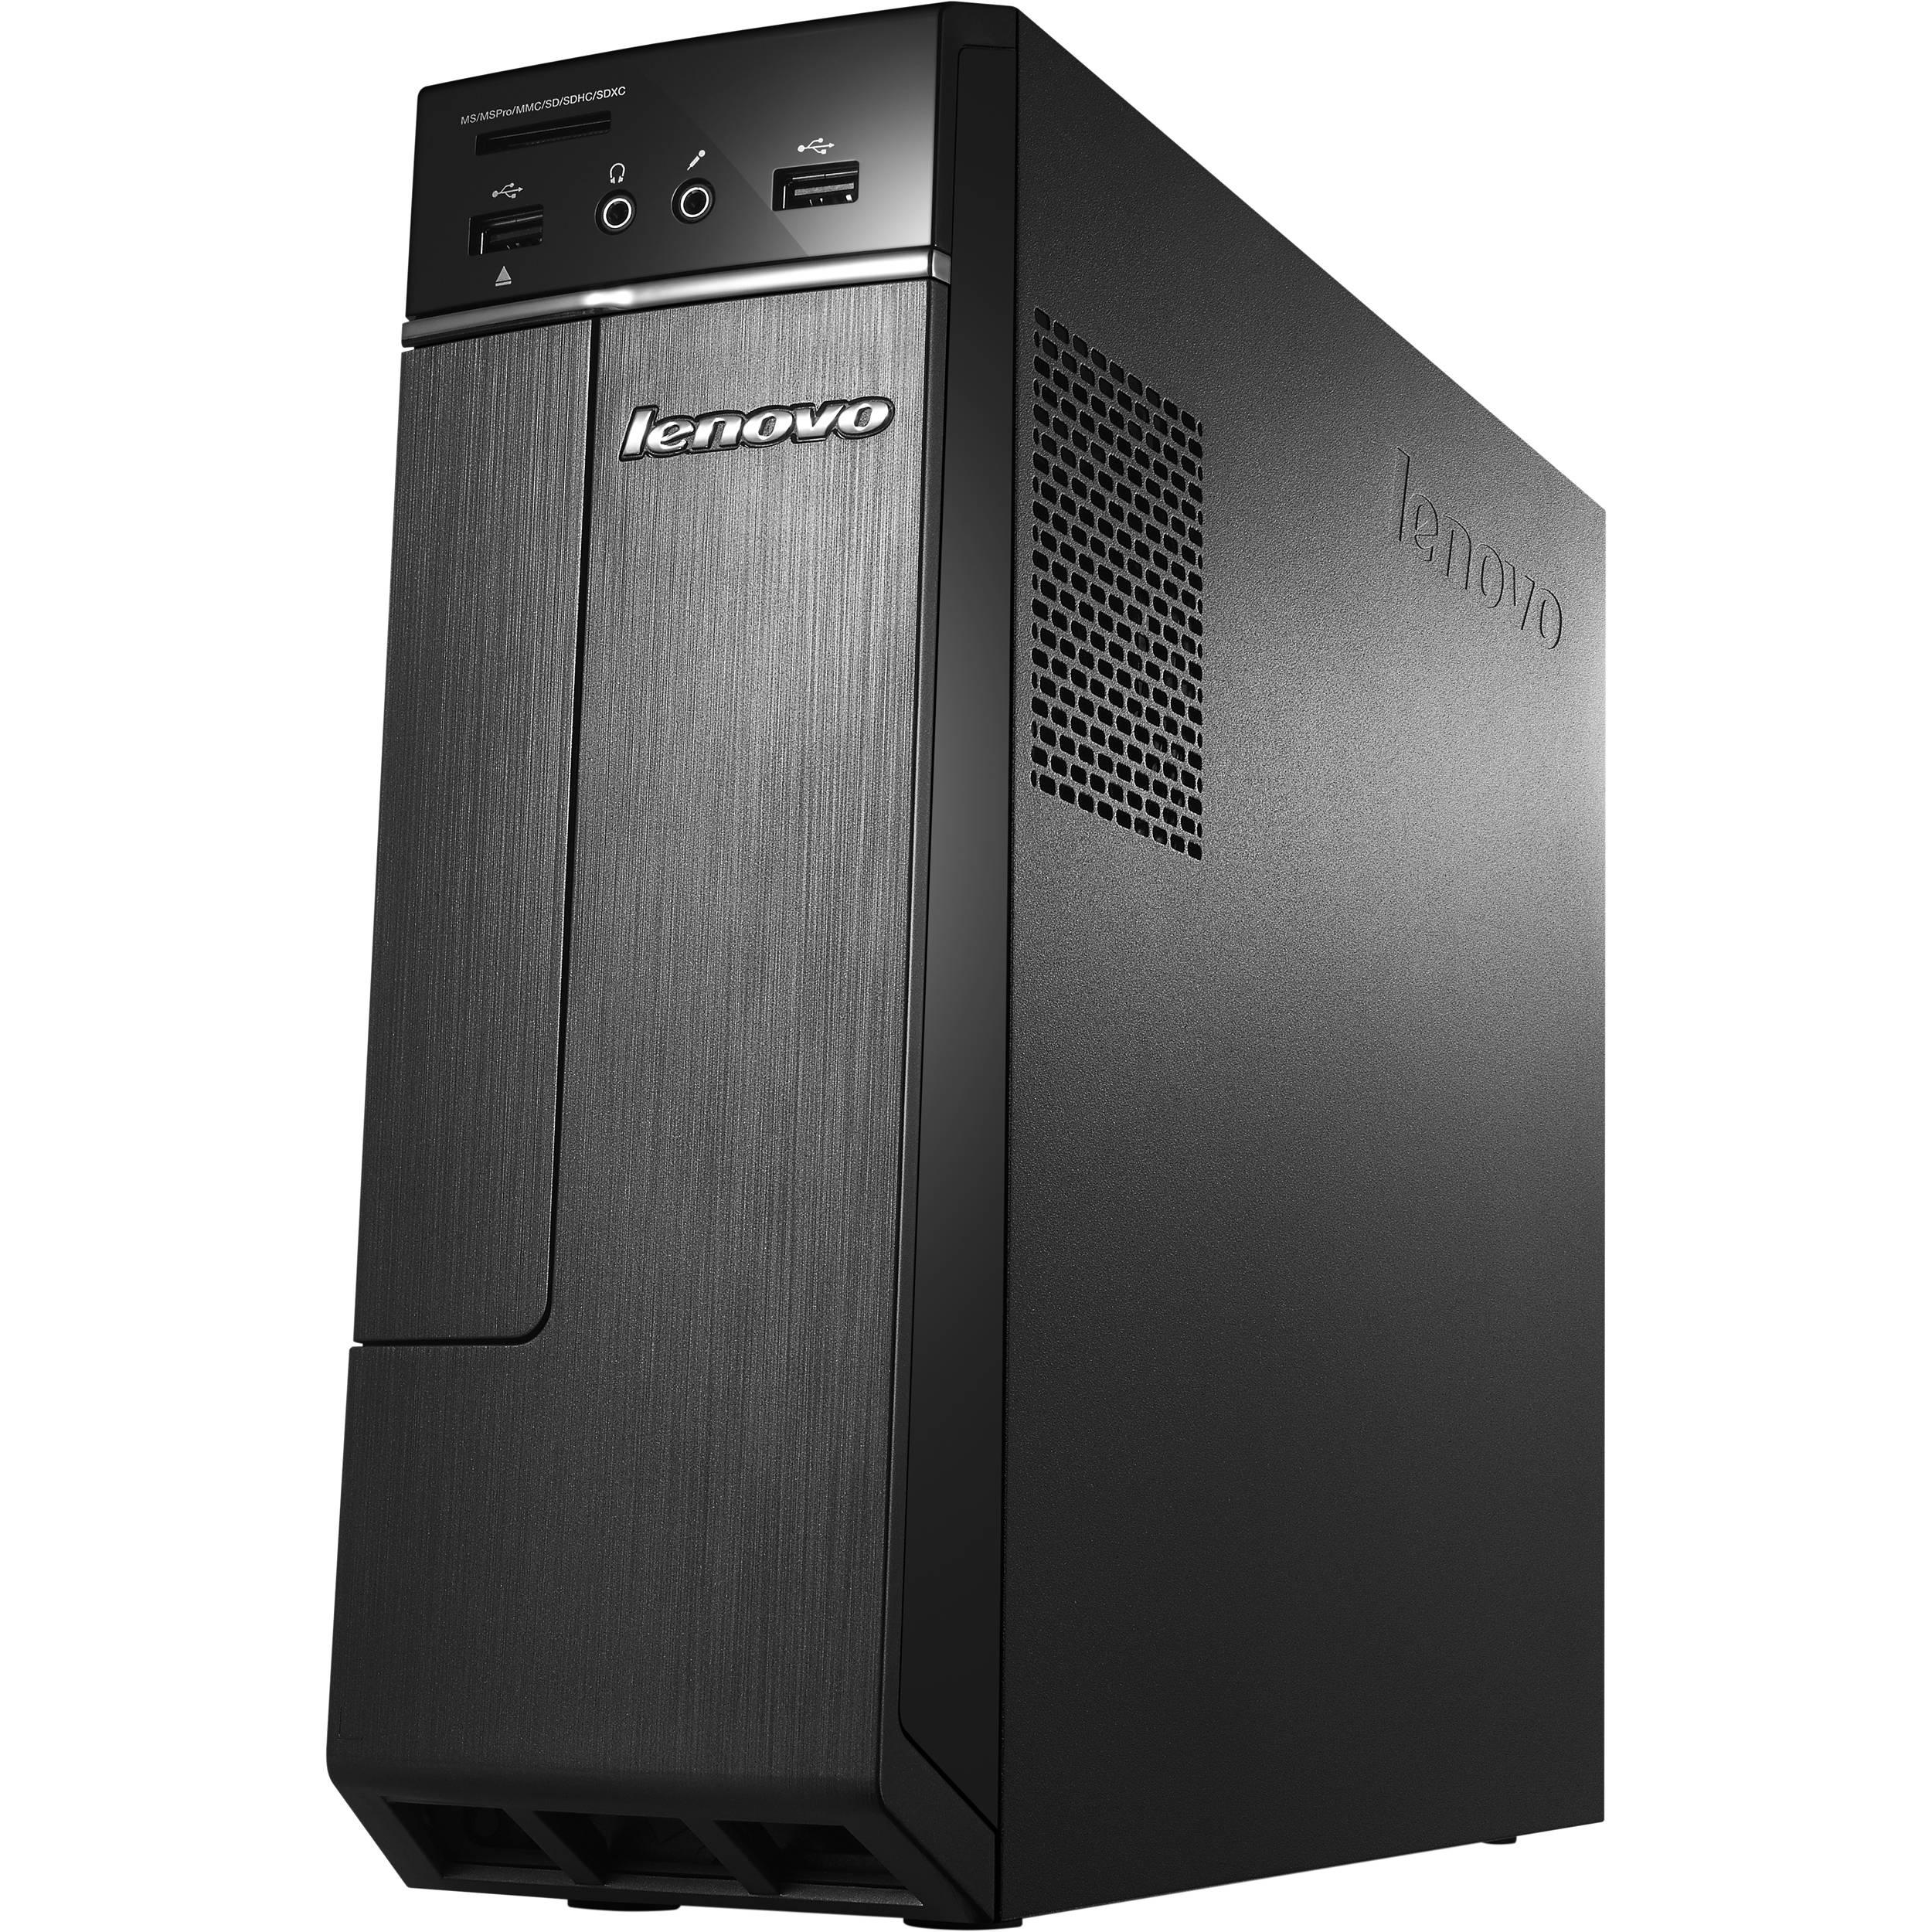 Lenovo Ideacentre 300s 11IBR Desktop Computer